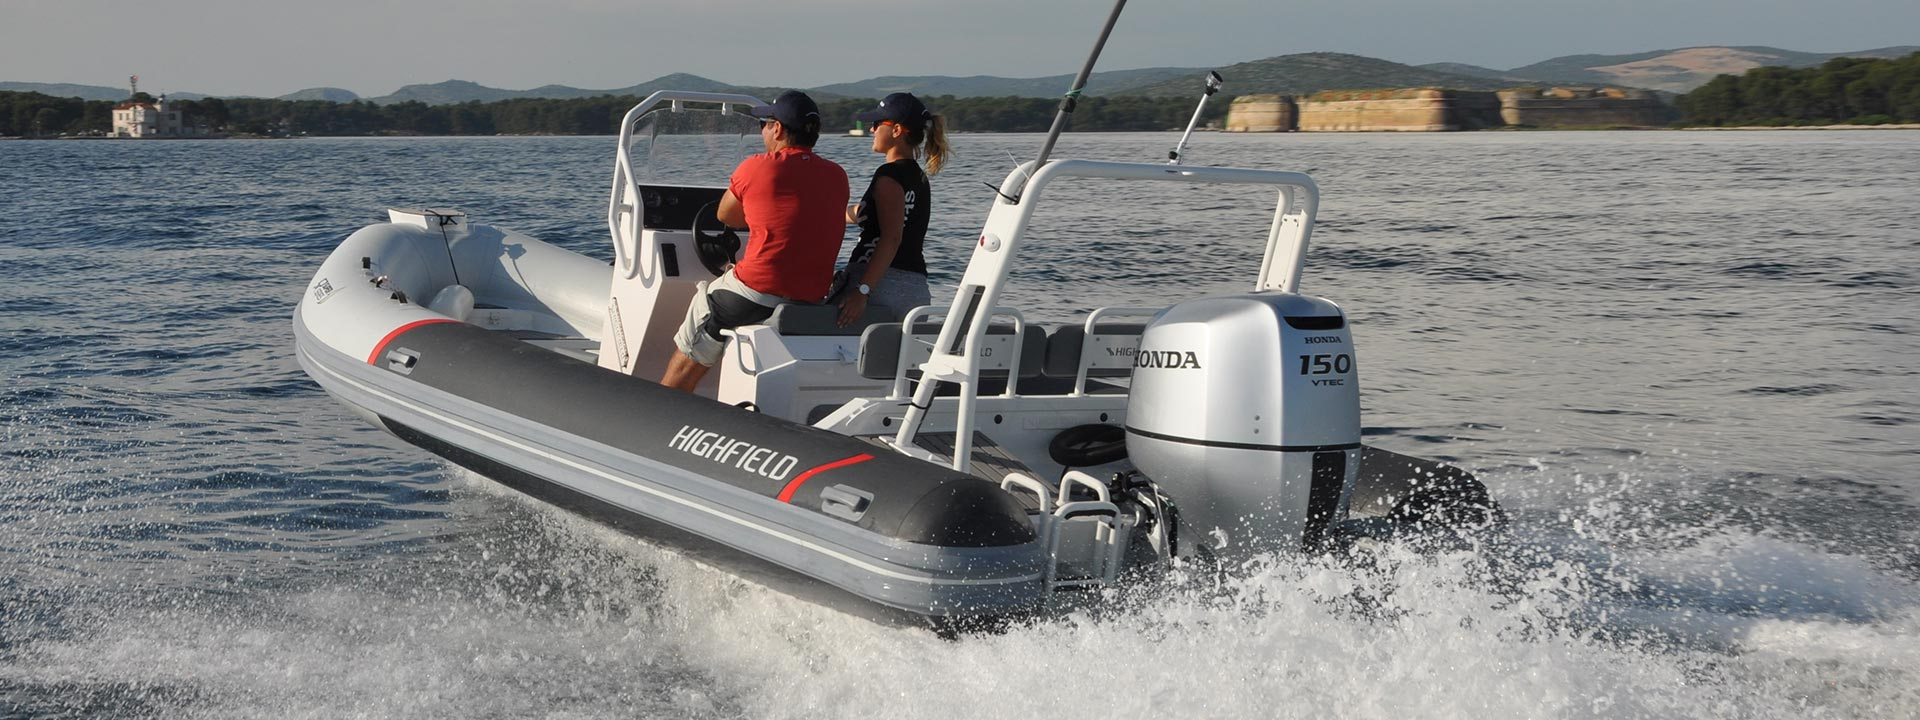 mayer-charter-boat-header-highfield-640-dl-01